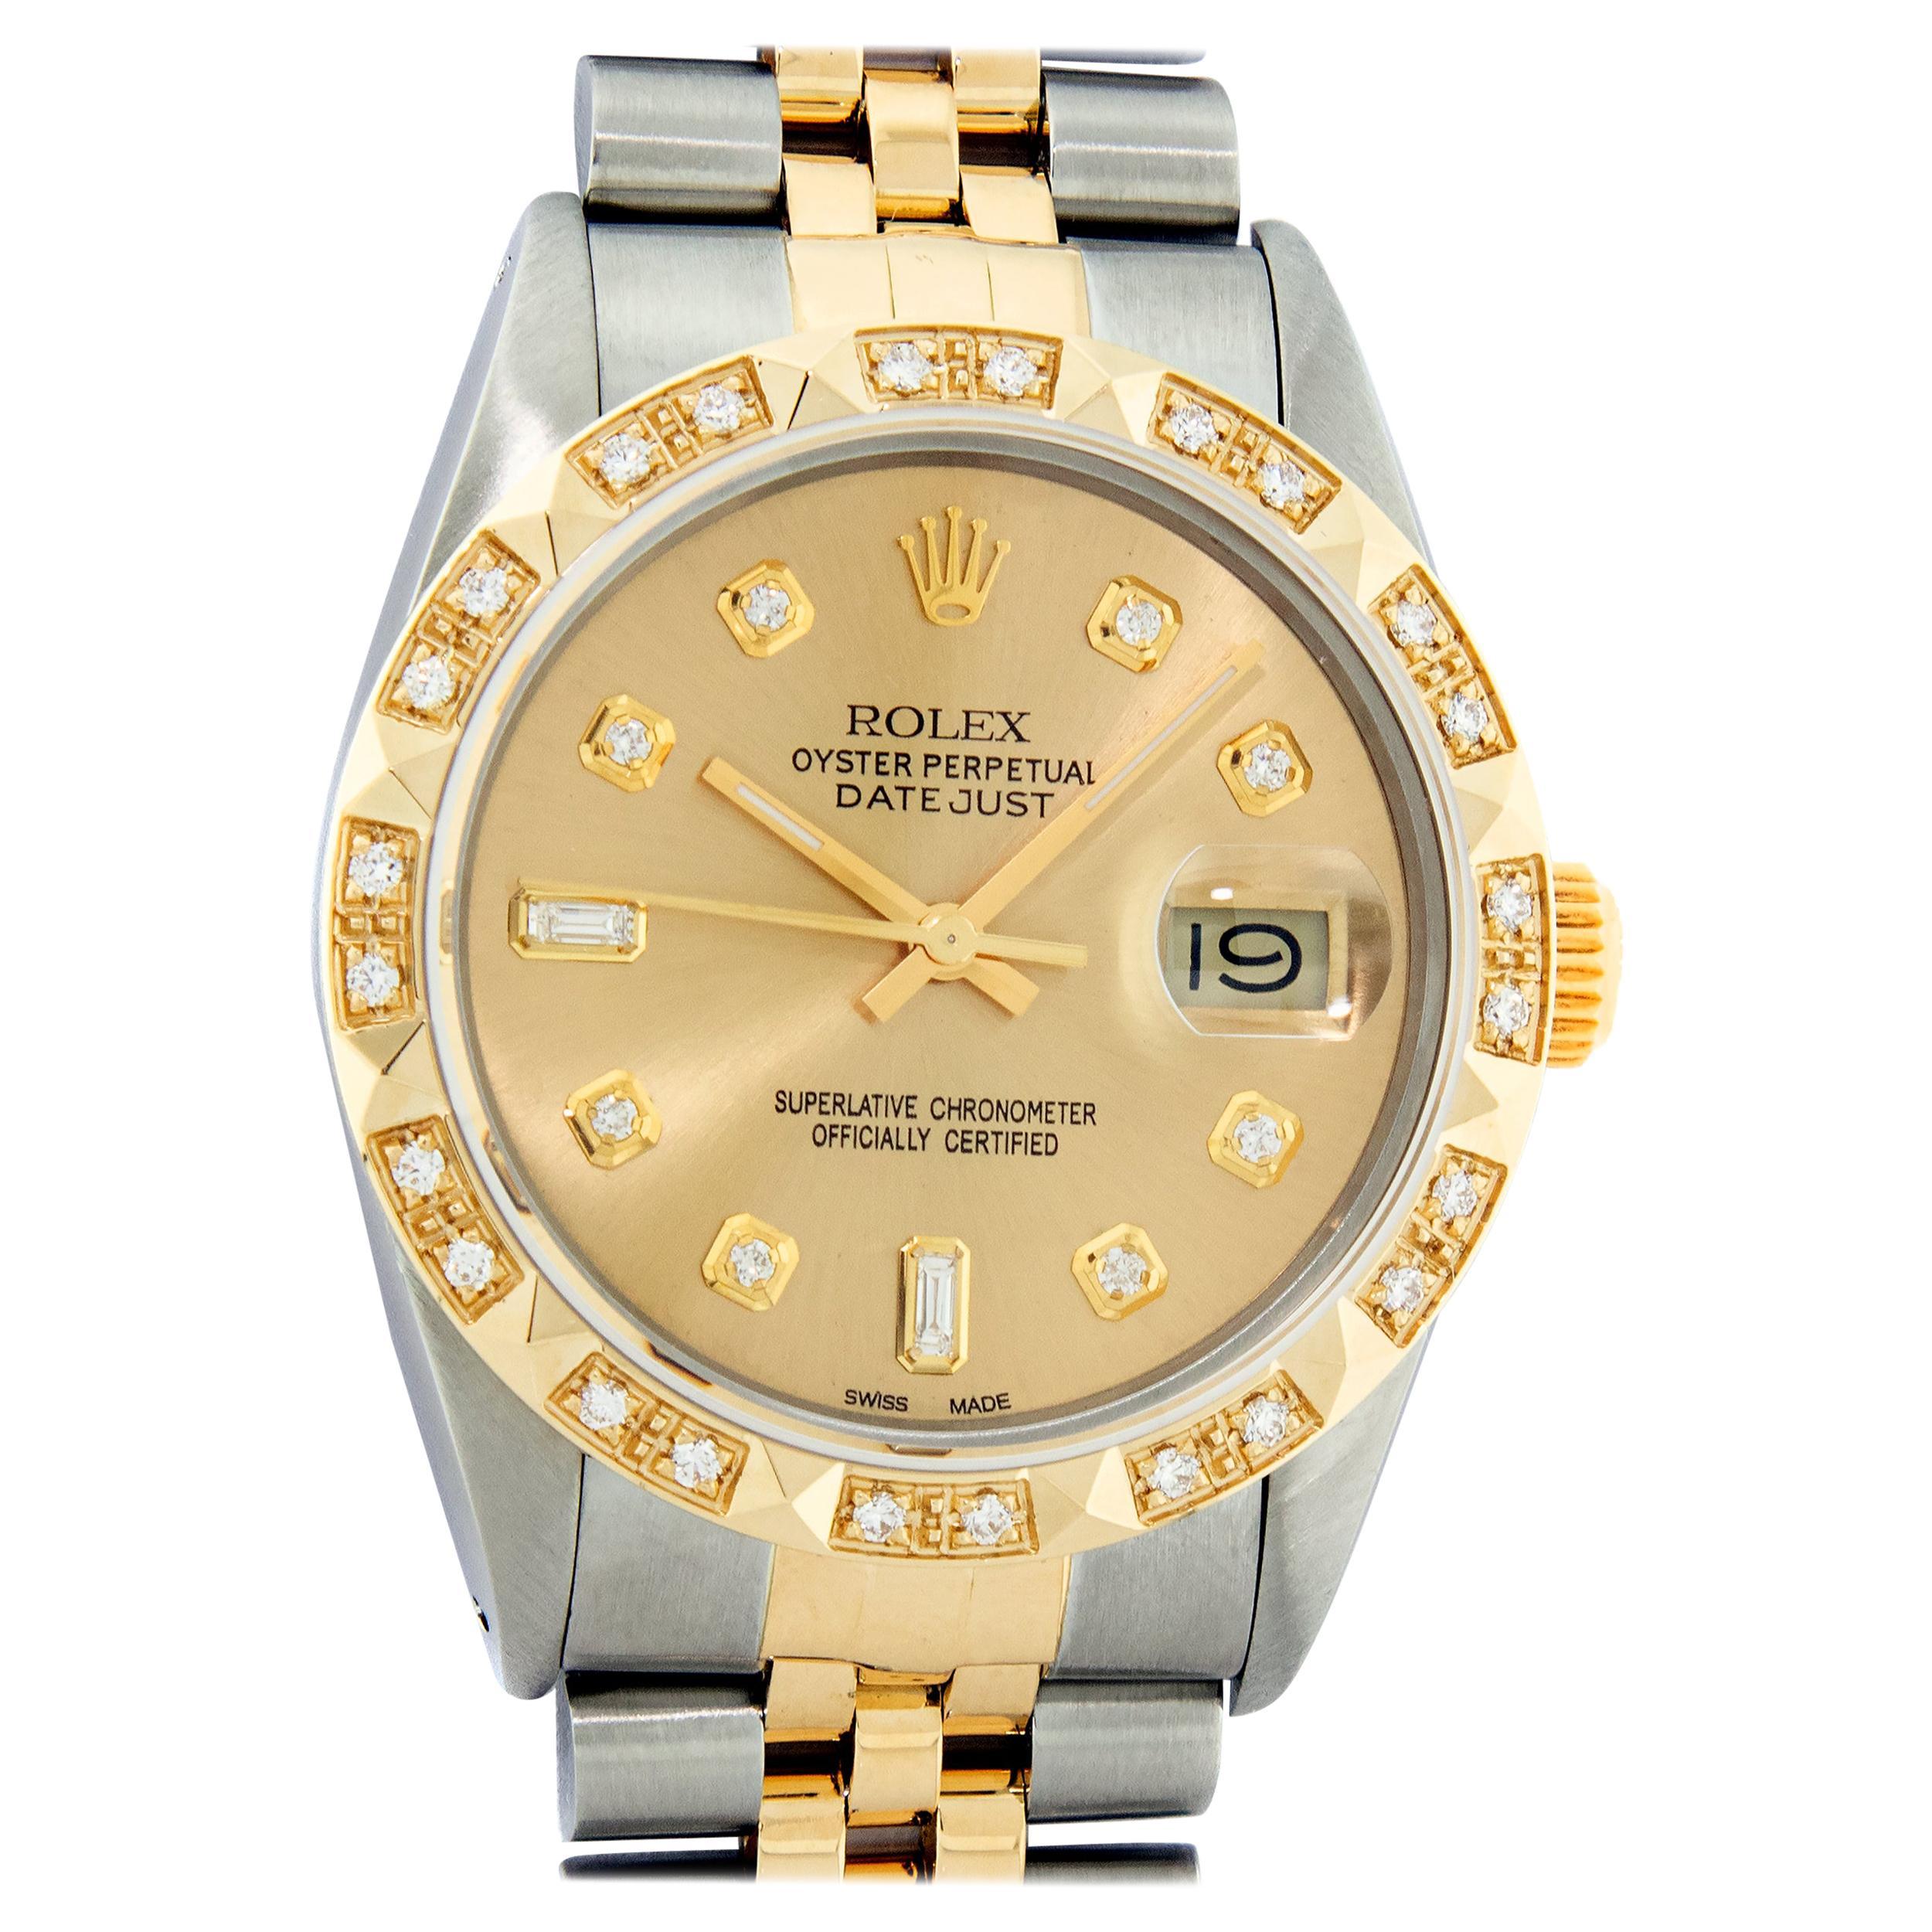 Rolex Men's Datejust SS and 18 Karat Yellow Gold Champagne Diamond Watch